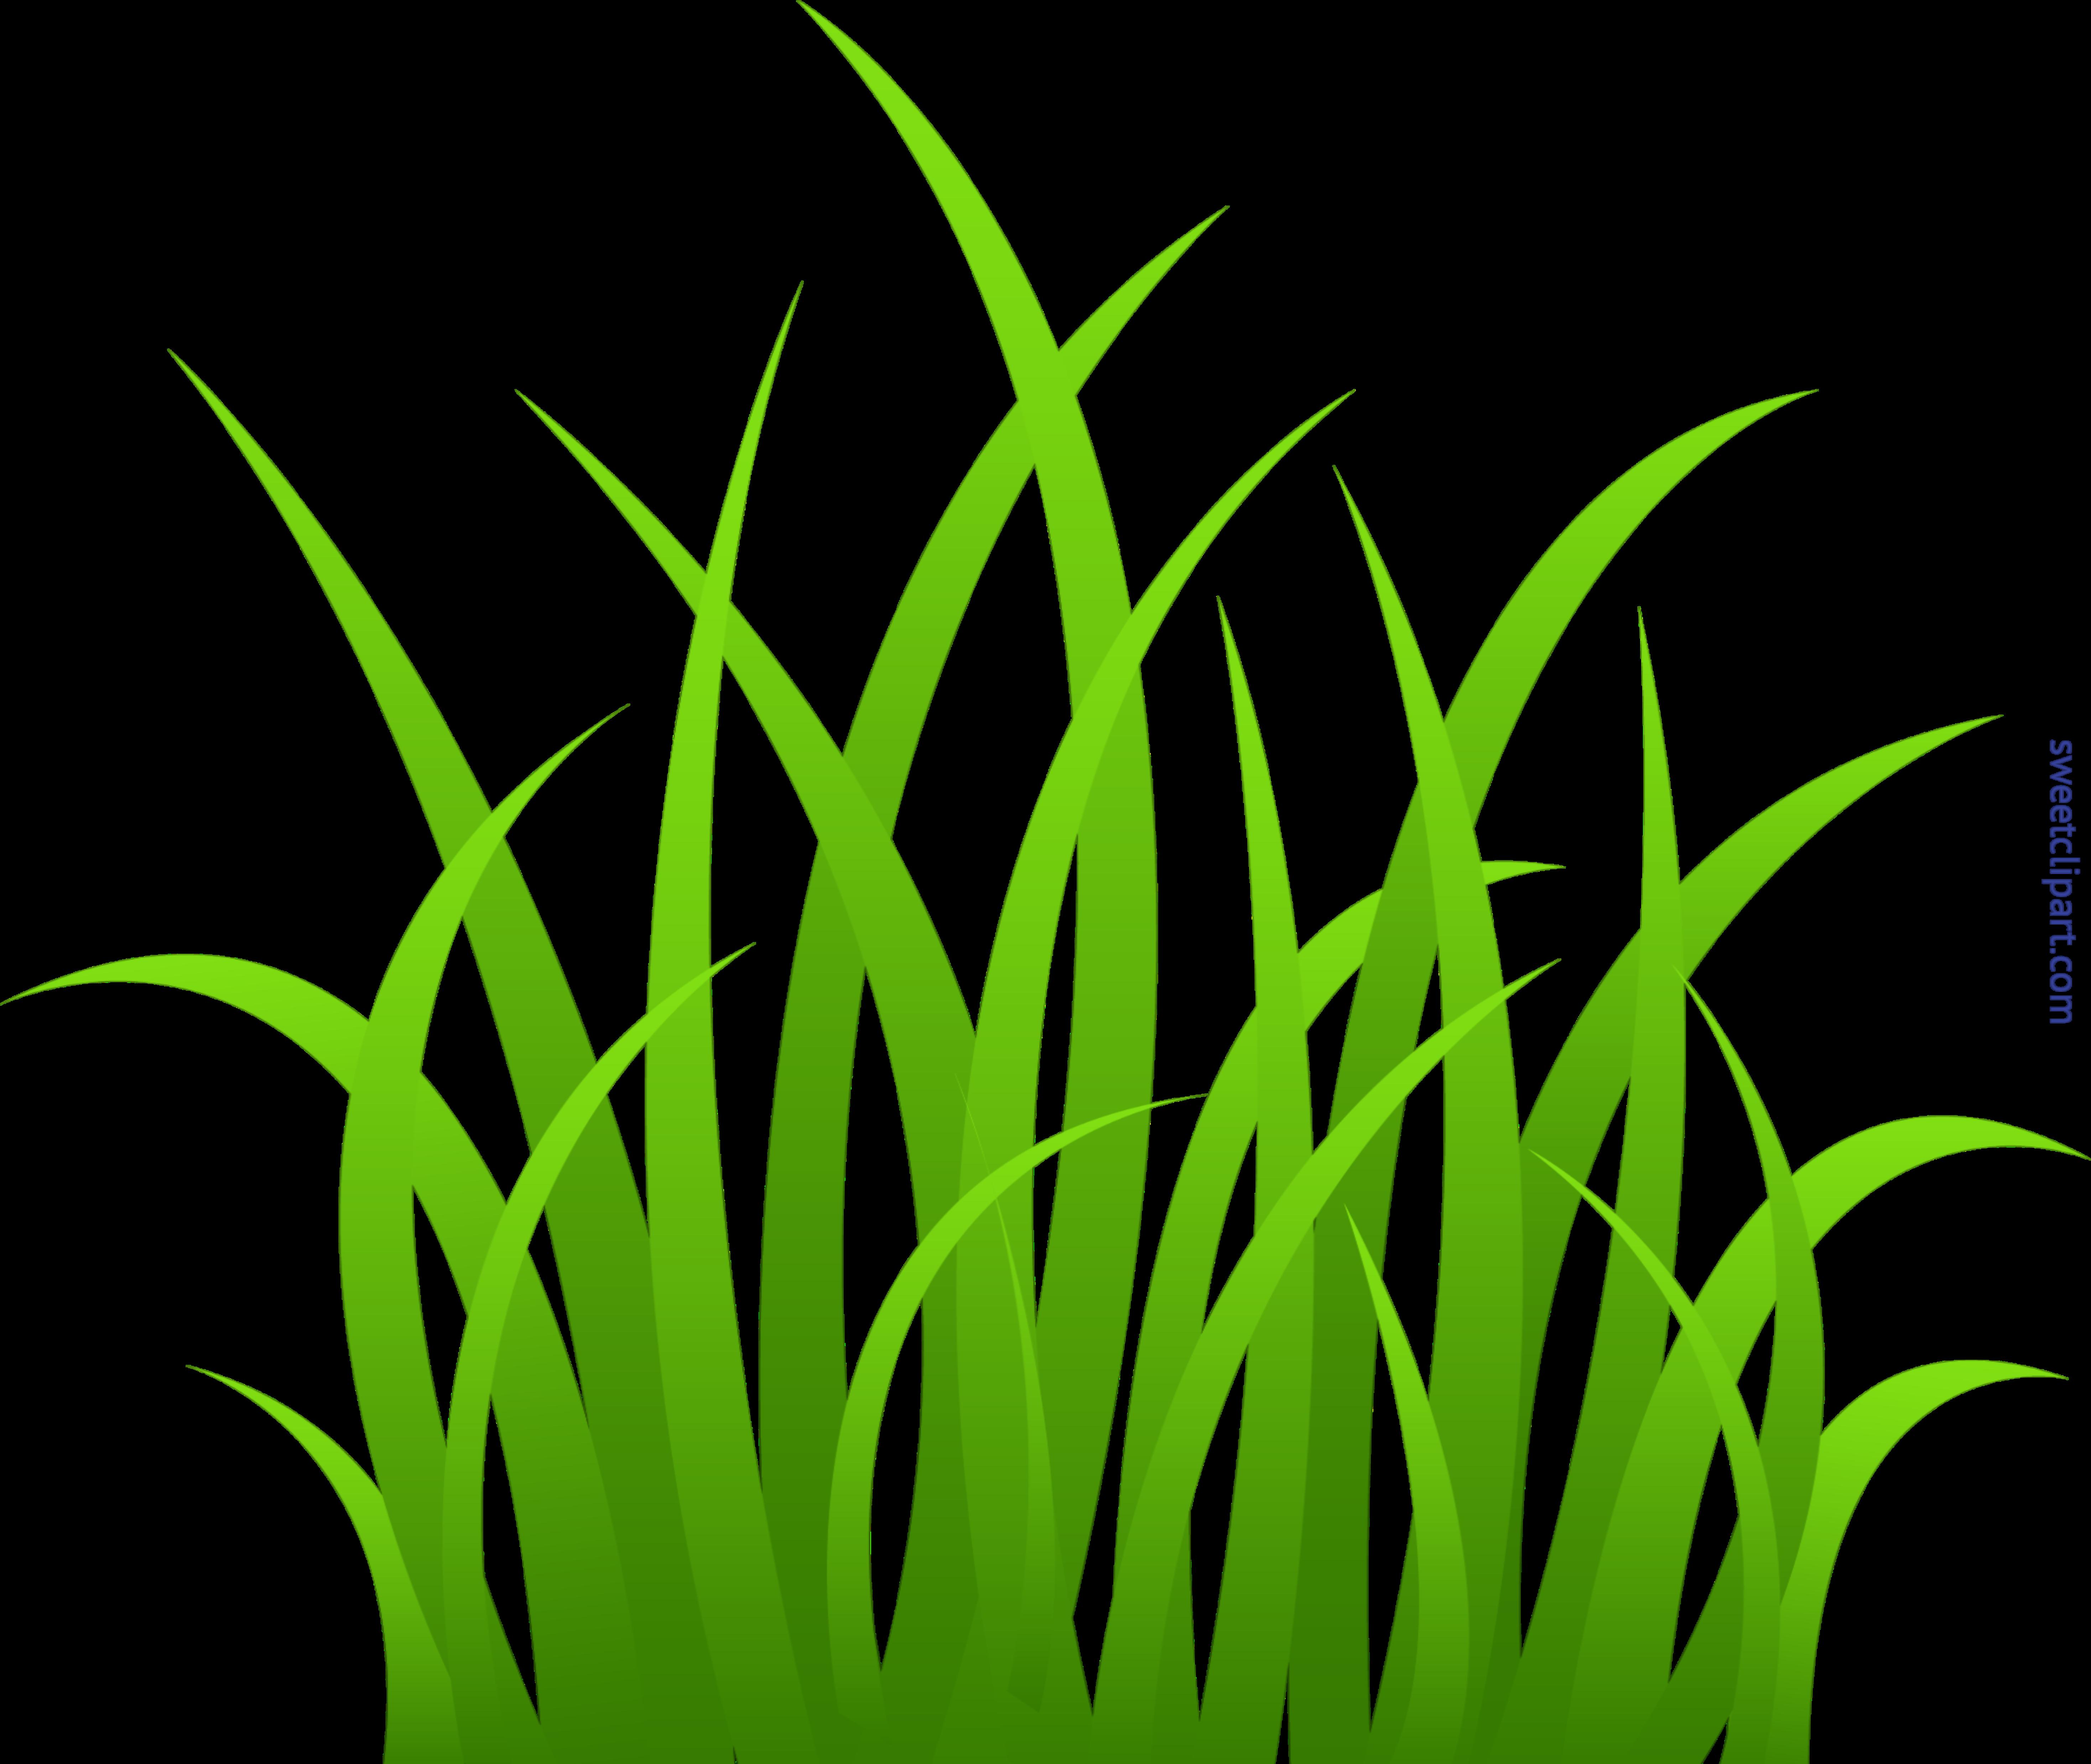 Strands clip art sweet. Clipart grass easy